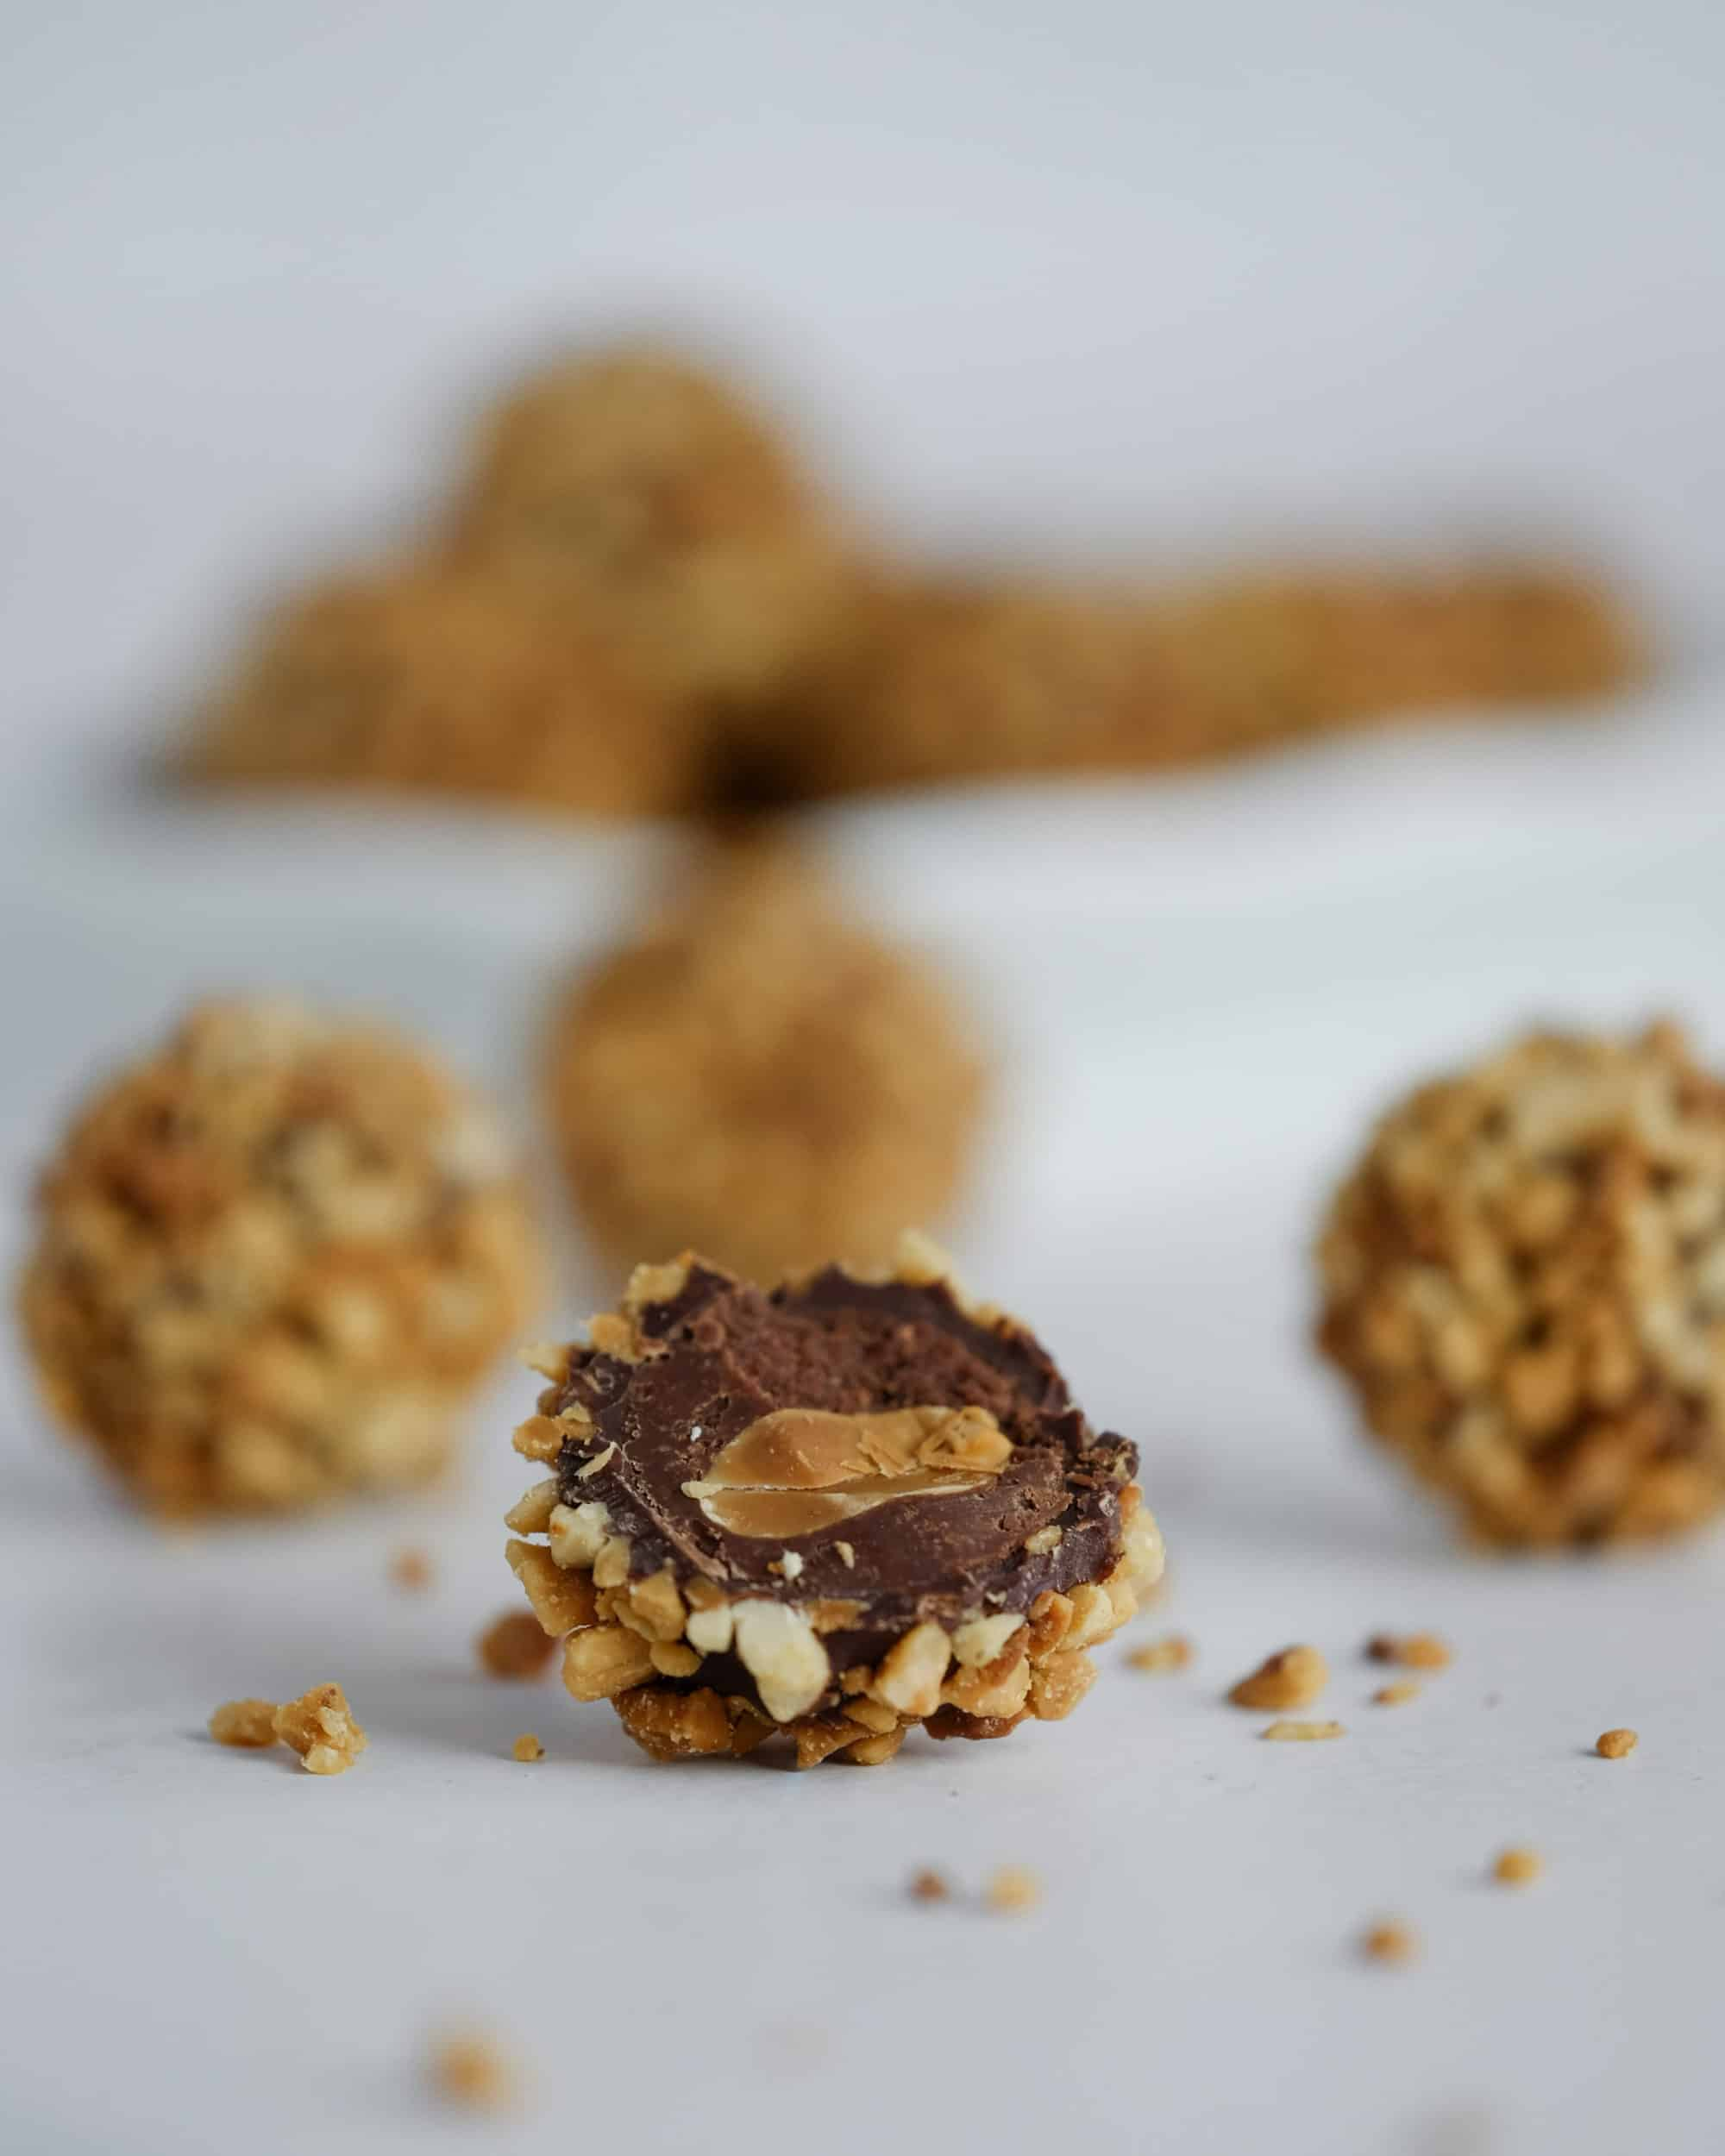 Chocolate Peanut Truffle cut and up close